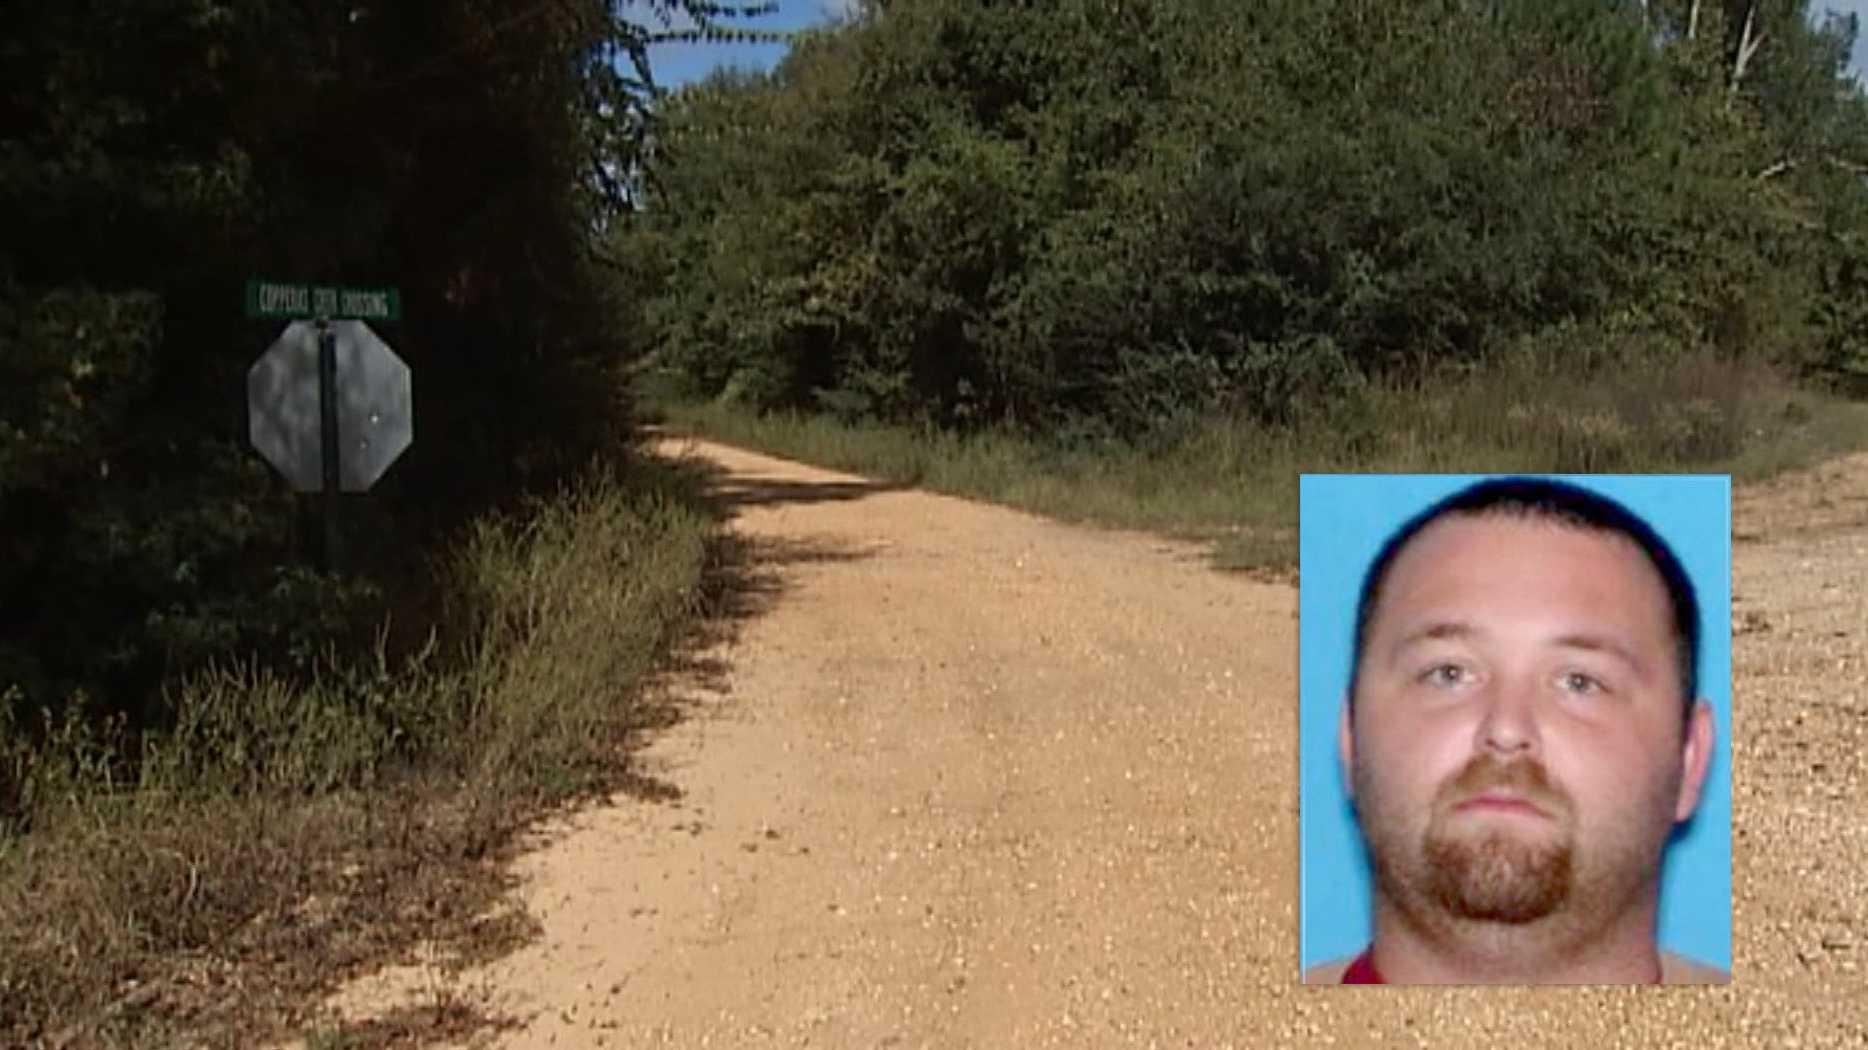 Nicholas Robert Dunlap is accused of murdering Jason Wayne Hutchinson in the Six Mile community back in 2013.